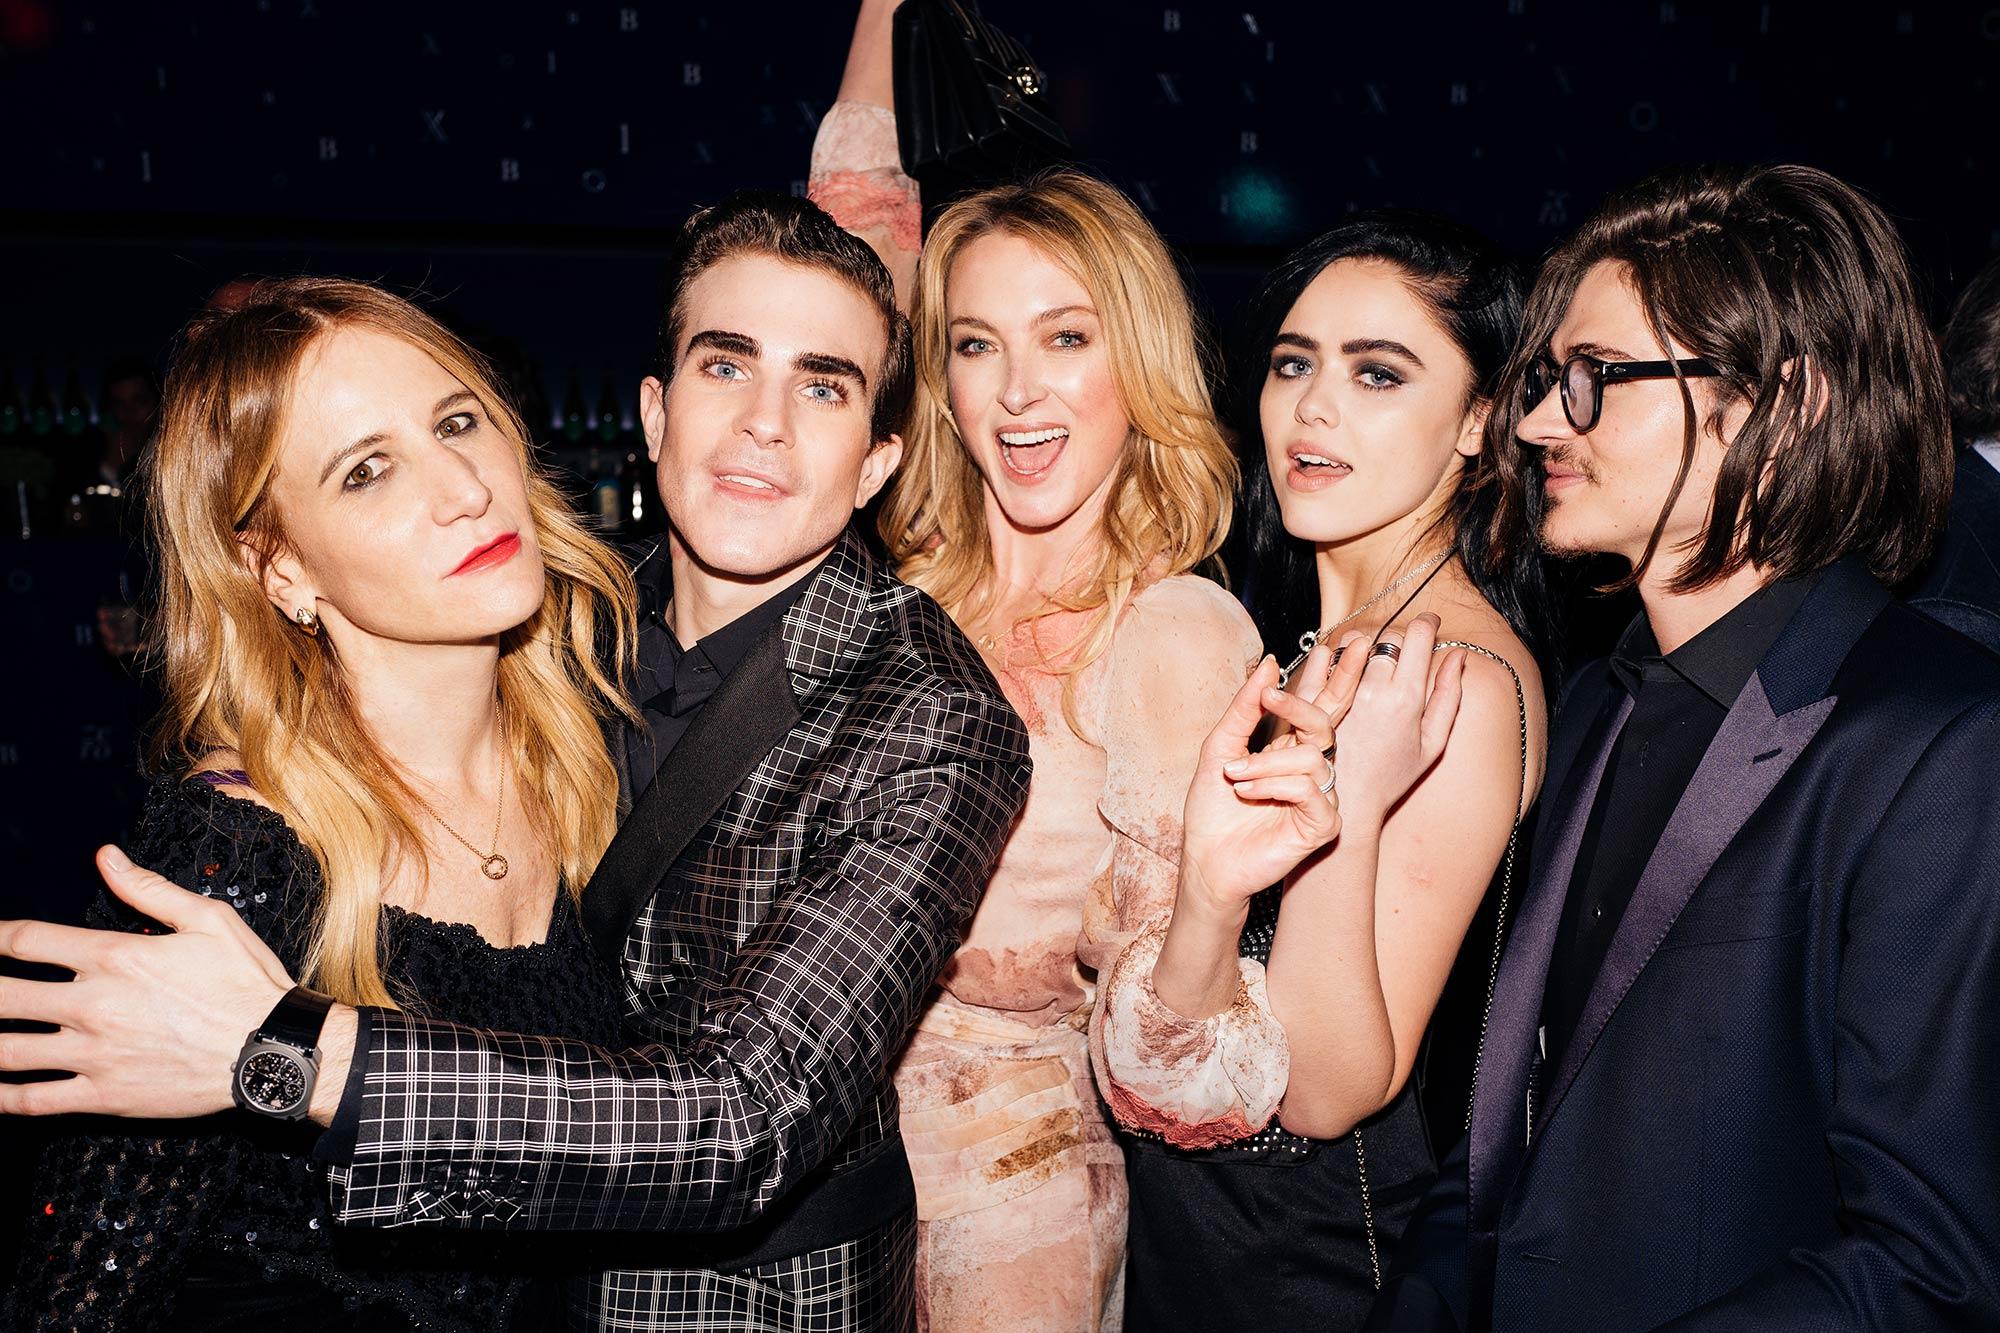 Bulgari Party B.zero1 - Lilly de Wittgenstein, Elisabetta Marra, Will Peltz, Carlo Sestini - Hair & Makeup Massimo Serini Team